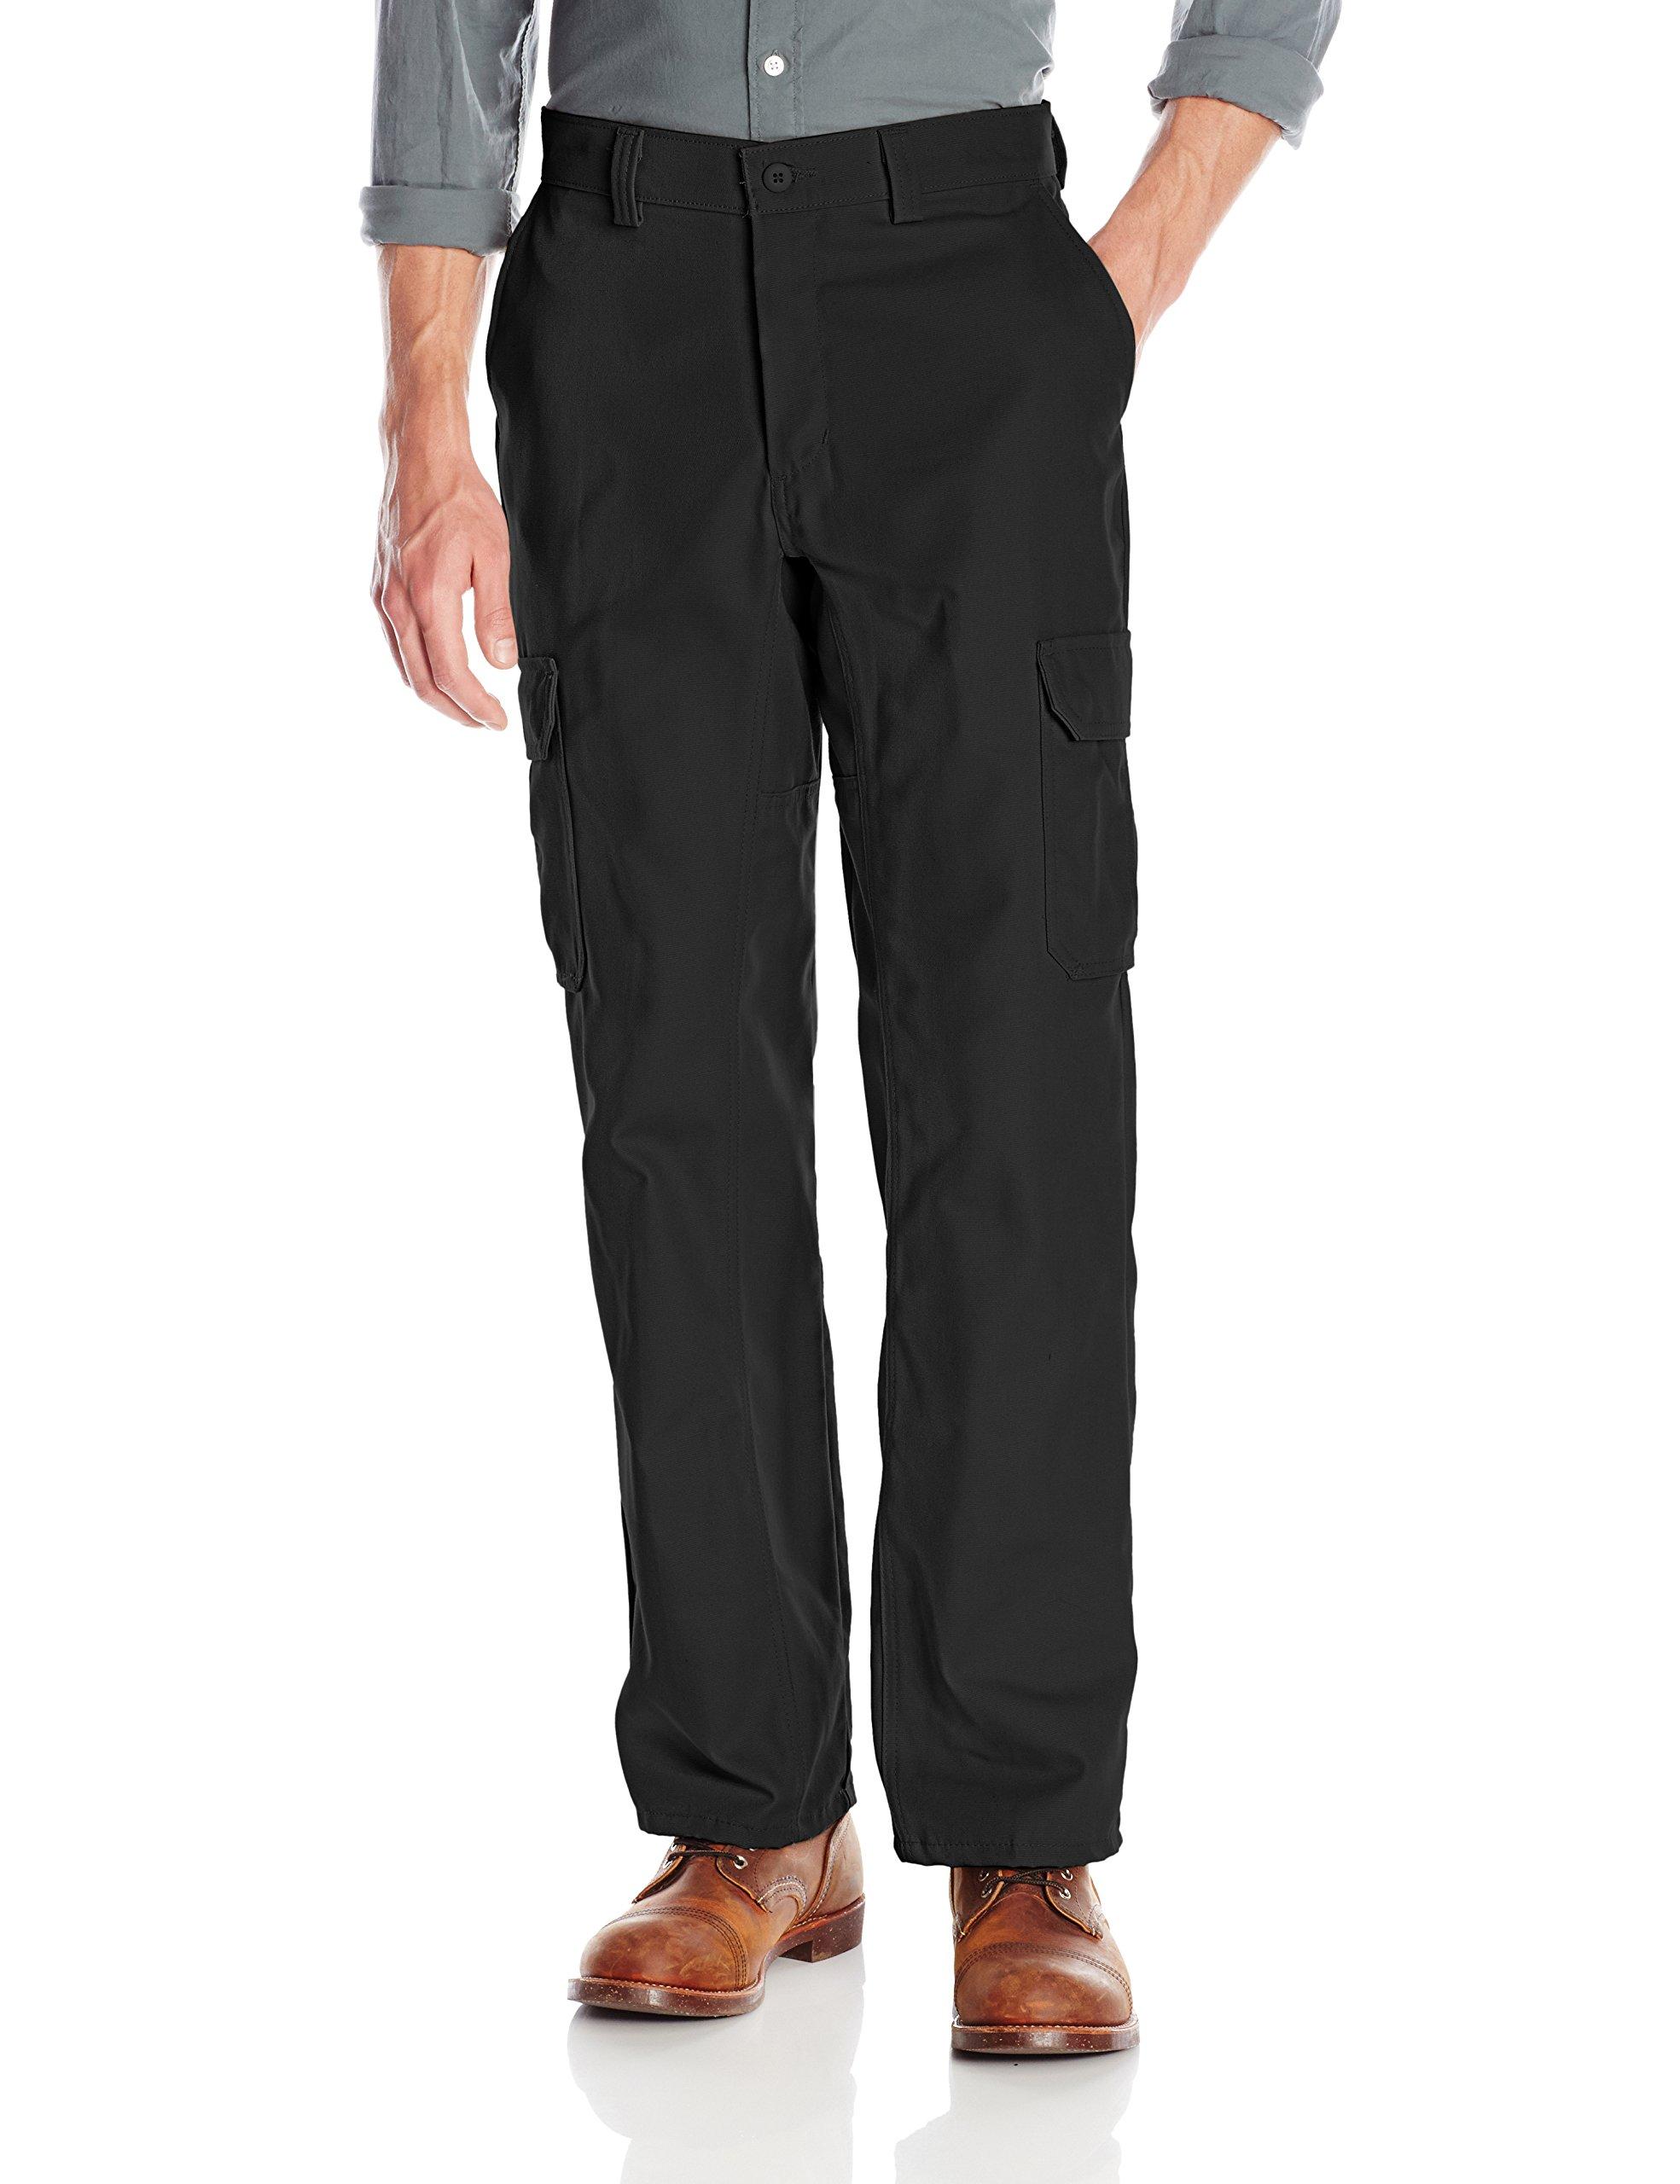 Wrangler Workwear Men's Functional Cargo Work Pant